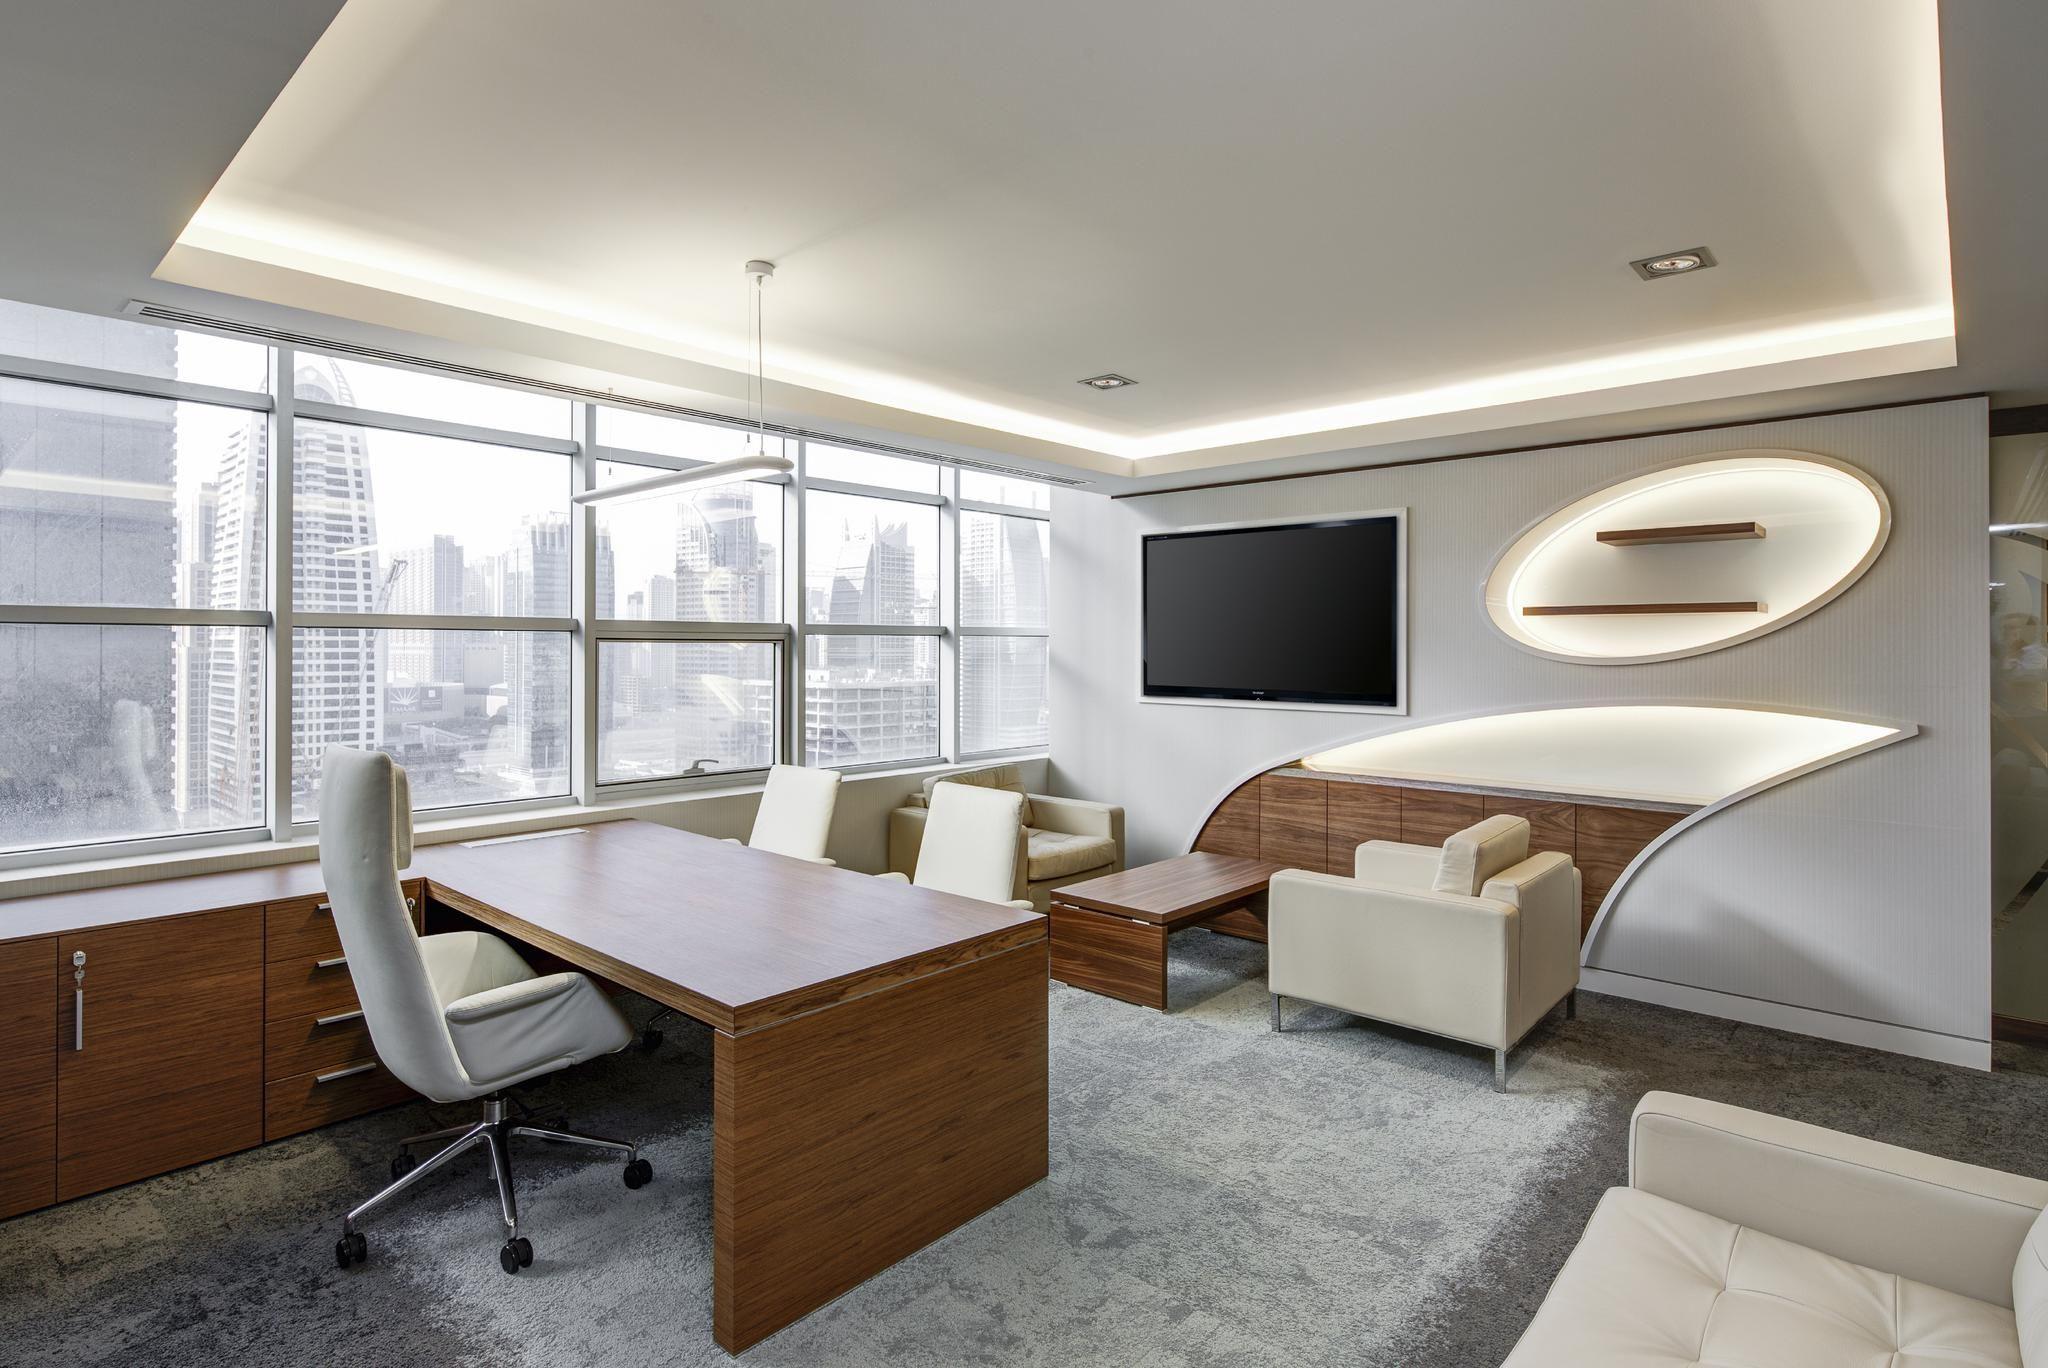 furniture market report